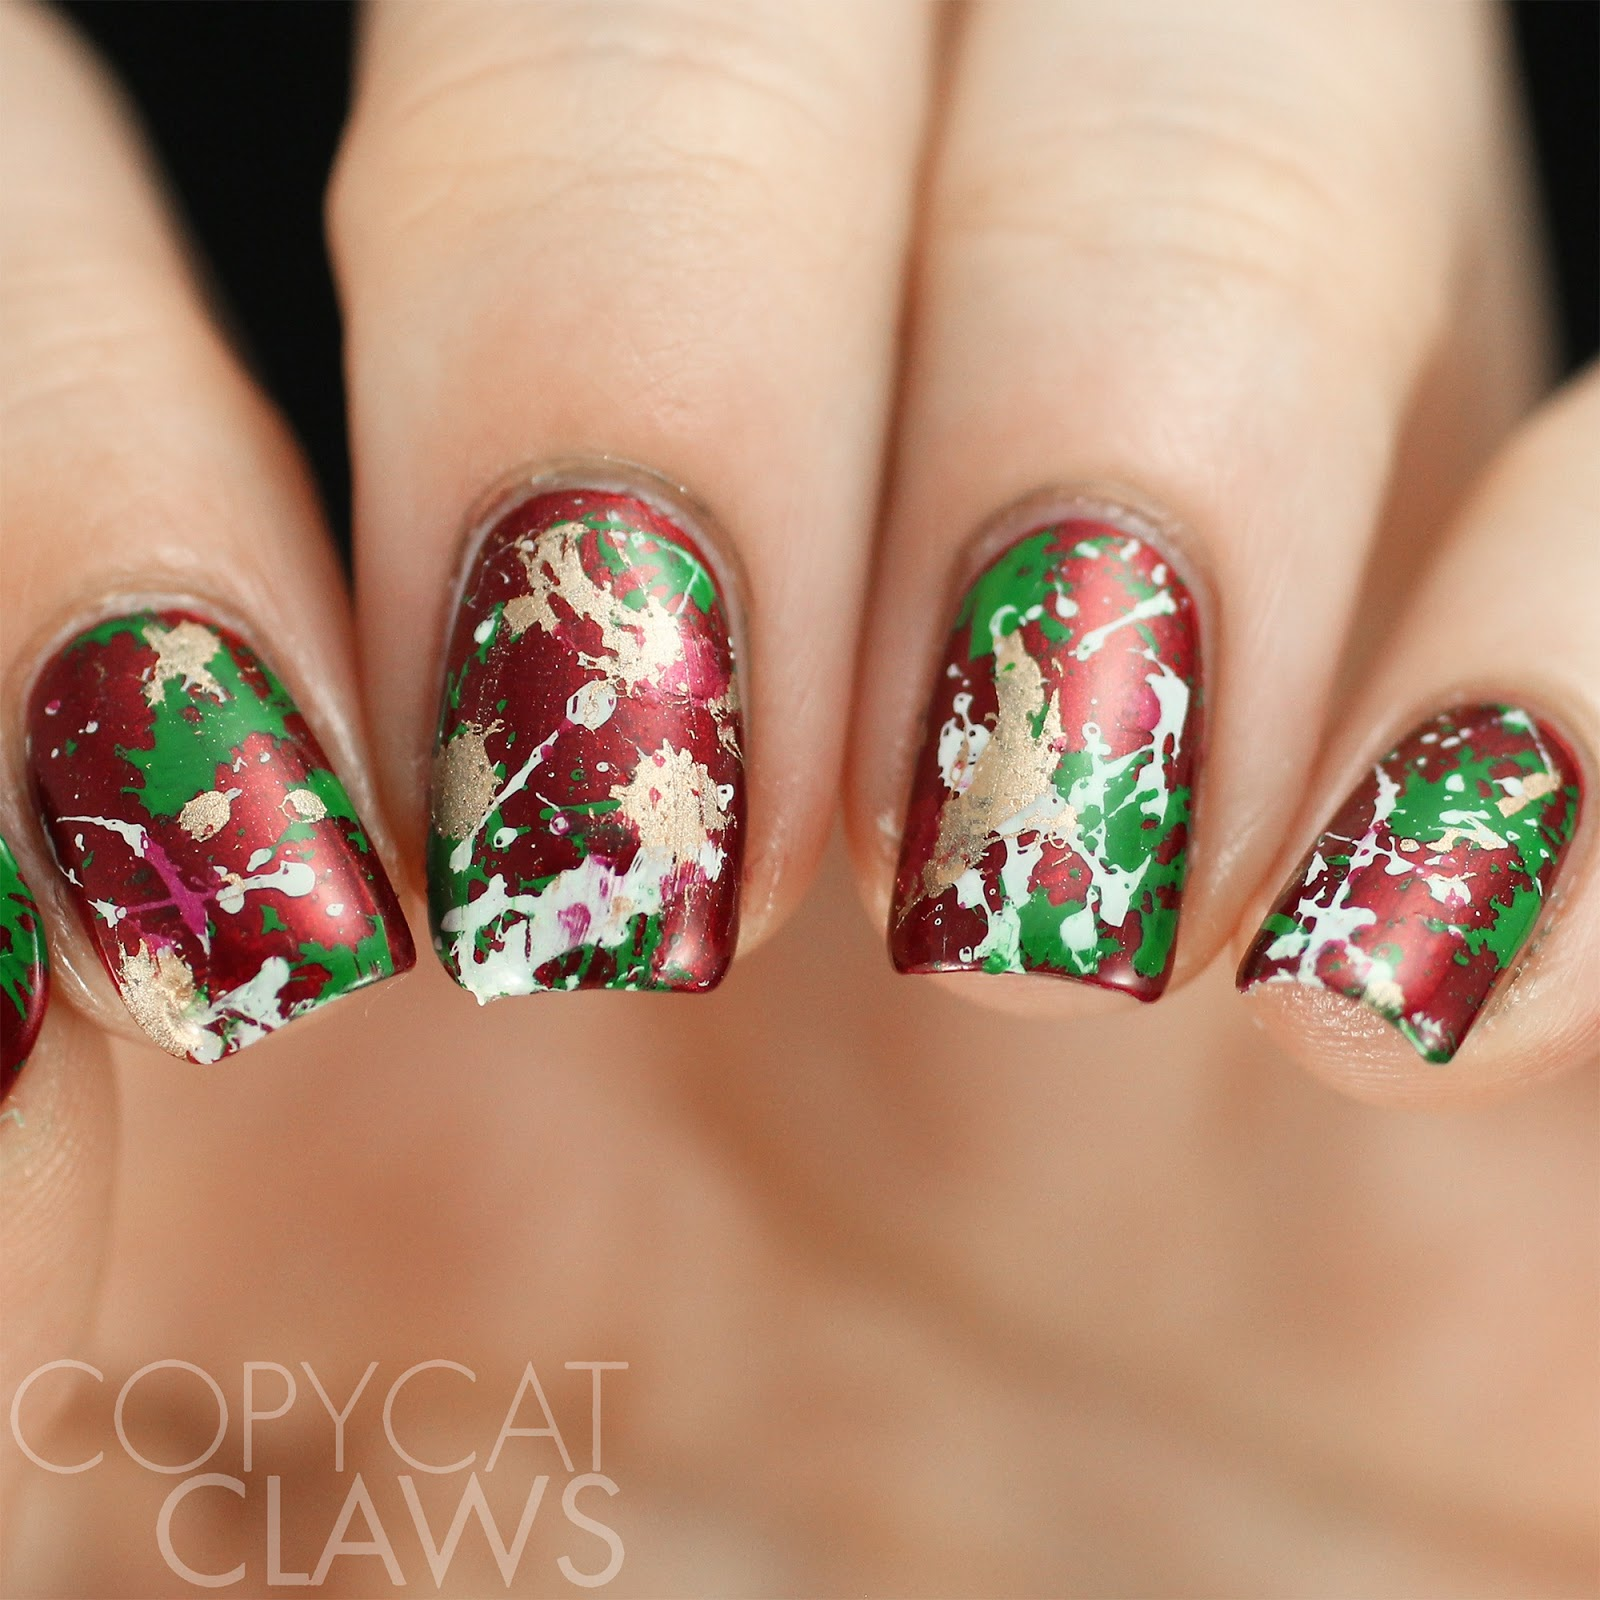 Copycat Claws: The Digit-al Dozen does December: Christmas Splatter